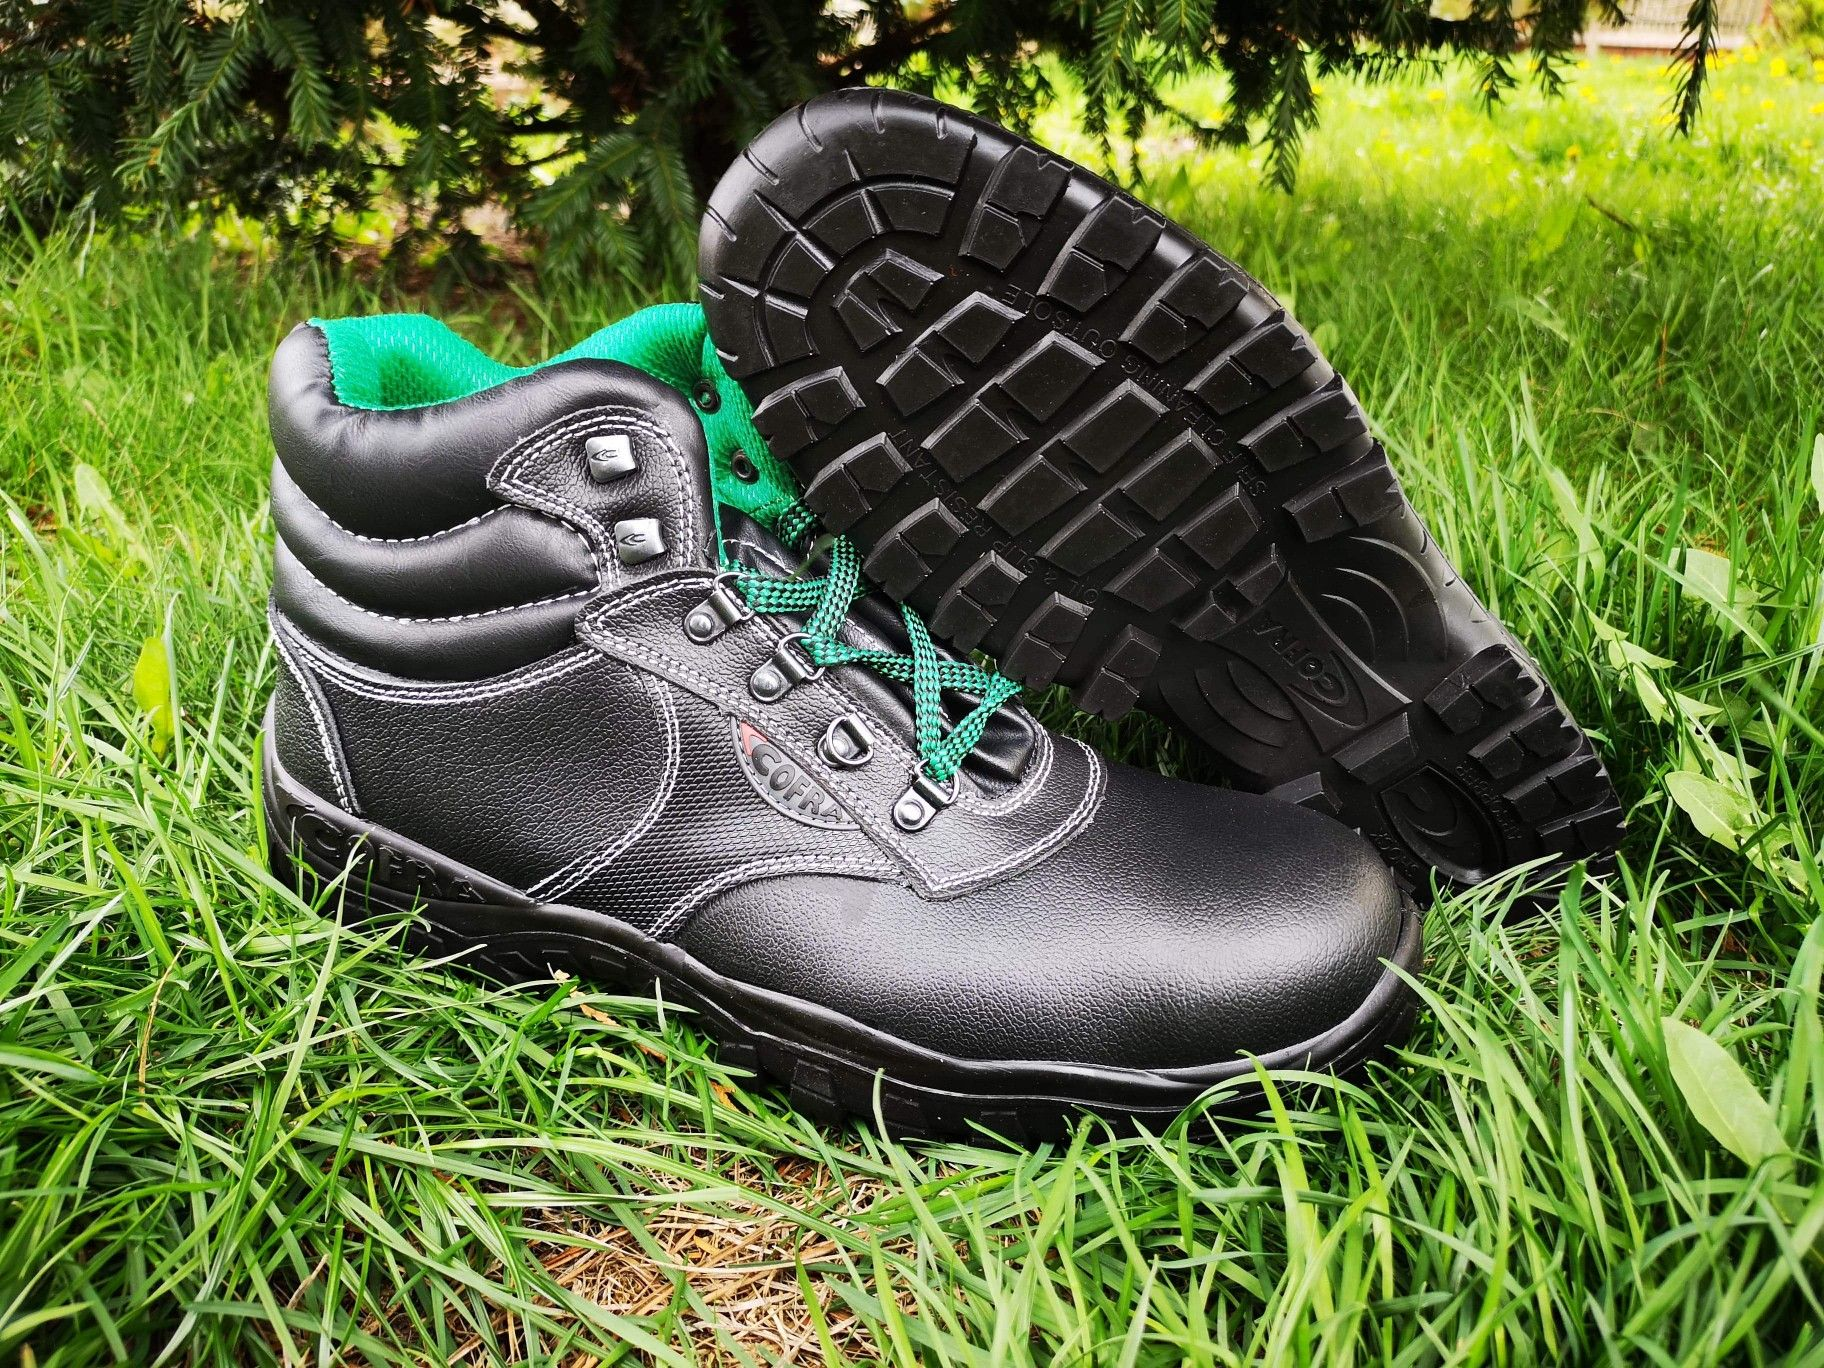 Trzewiki Buty Bezpieczne Brc Mercurio Boots Hiking Boots Air Jordan Sneaker